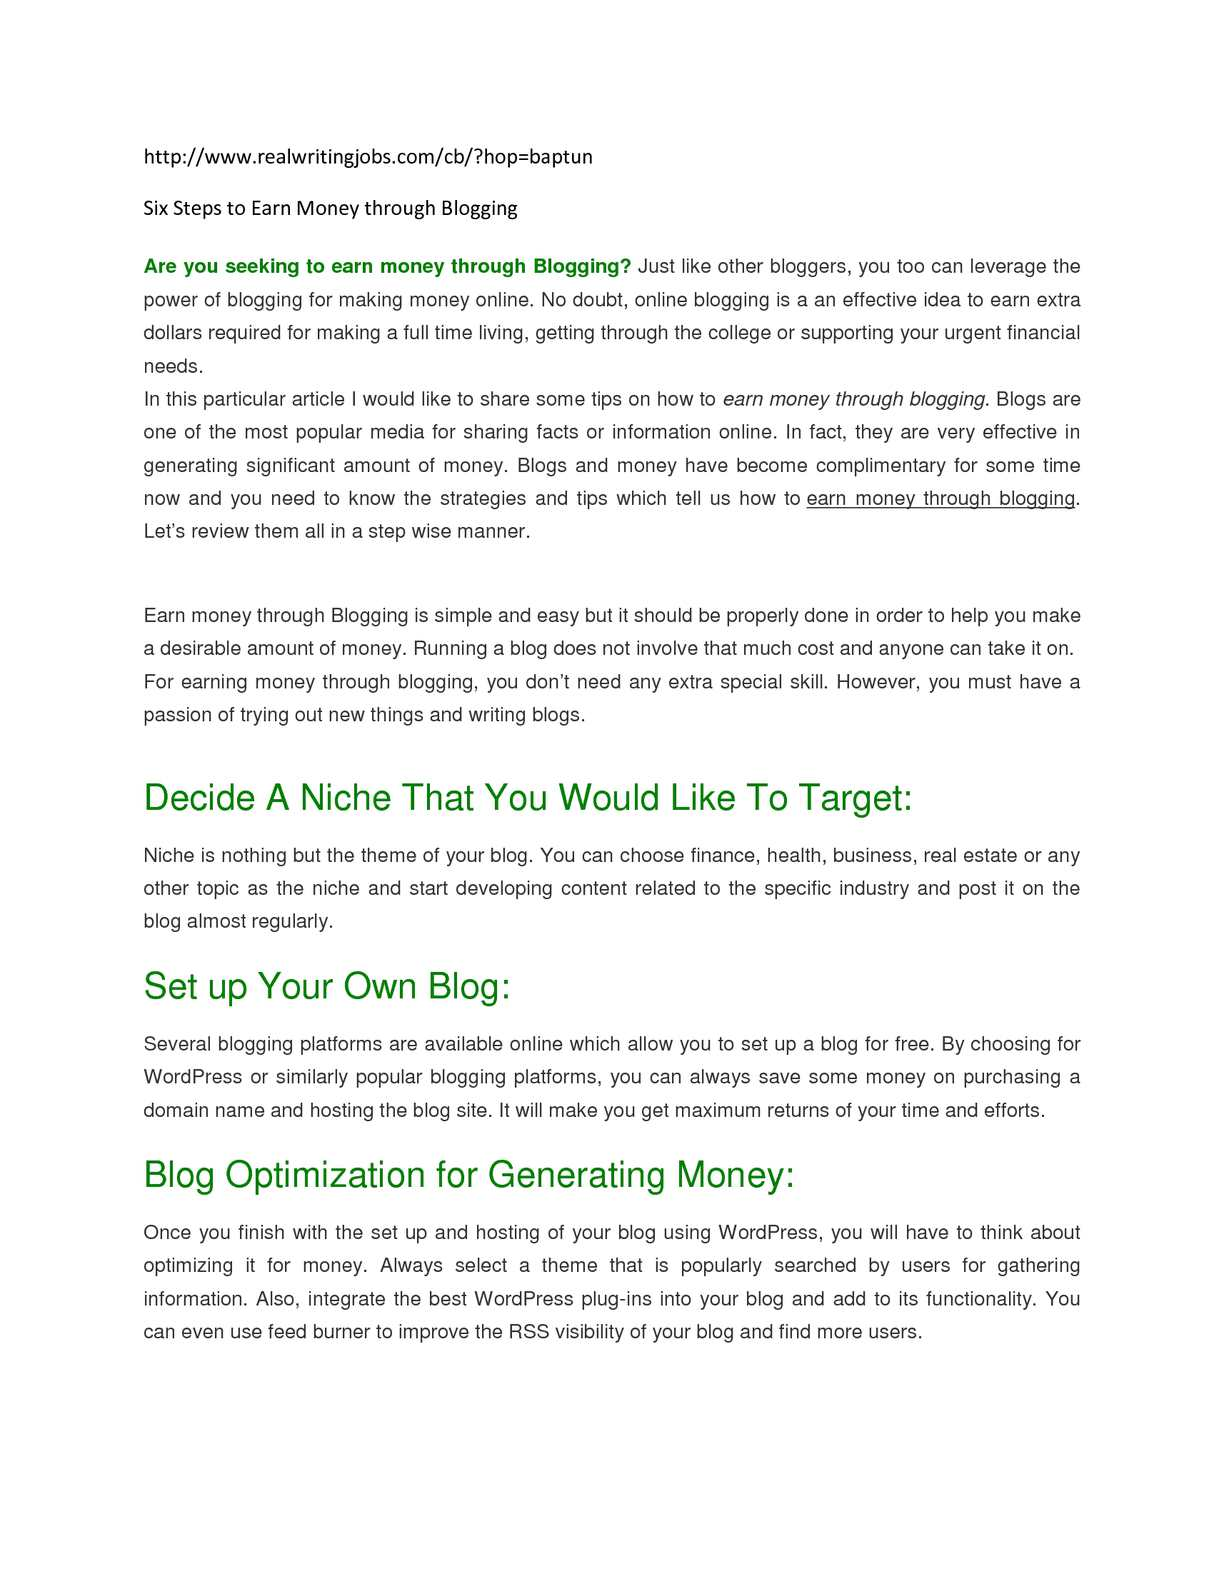 Calaméo   Six Steps to Earn Money through Blogging